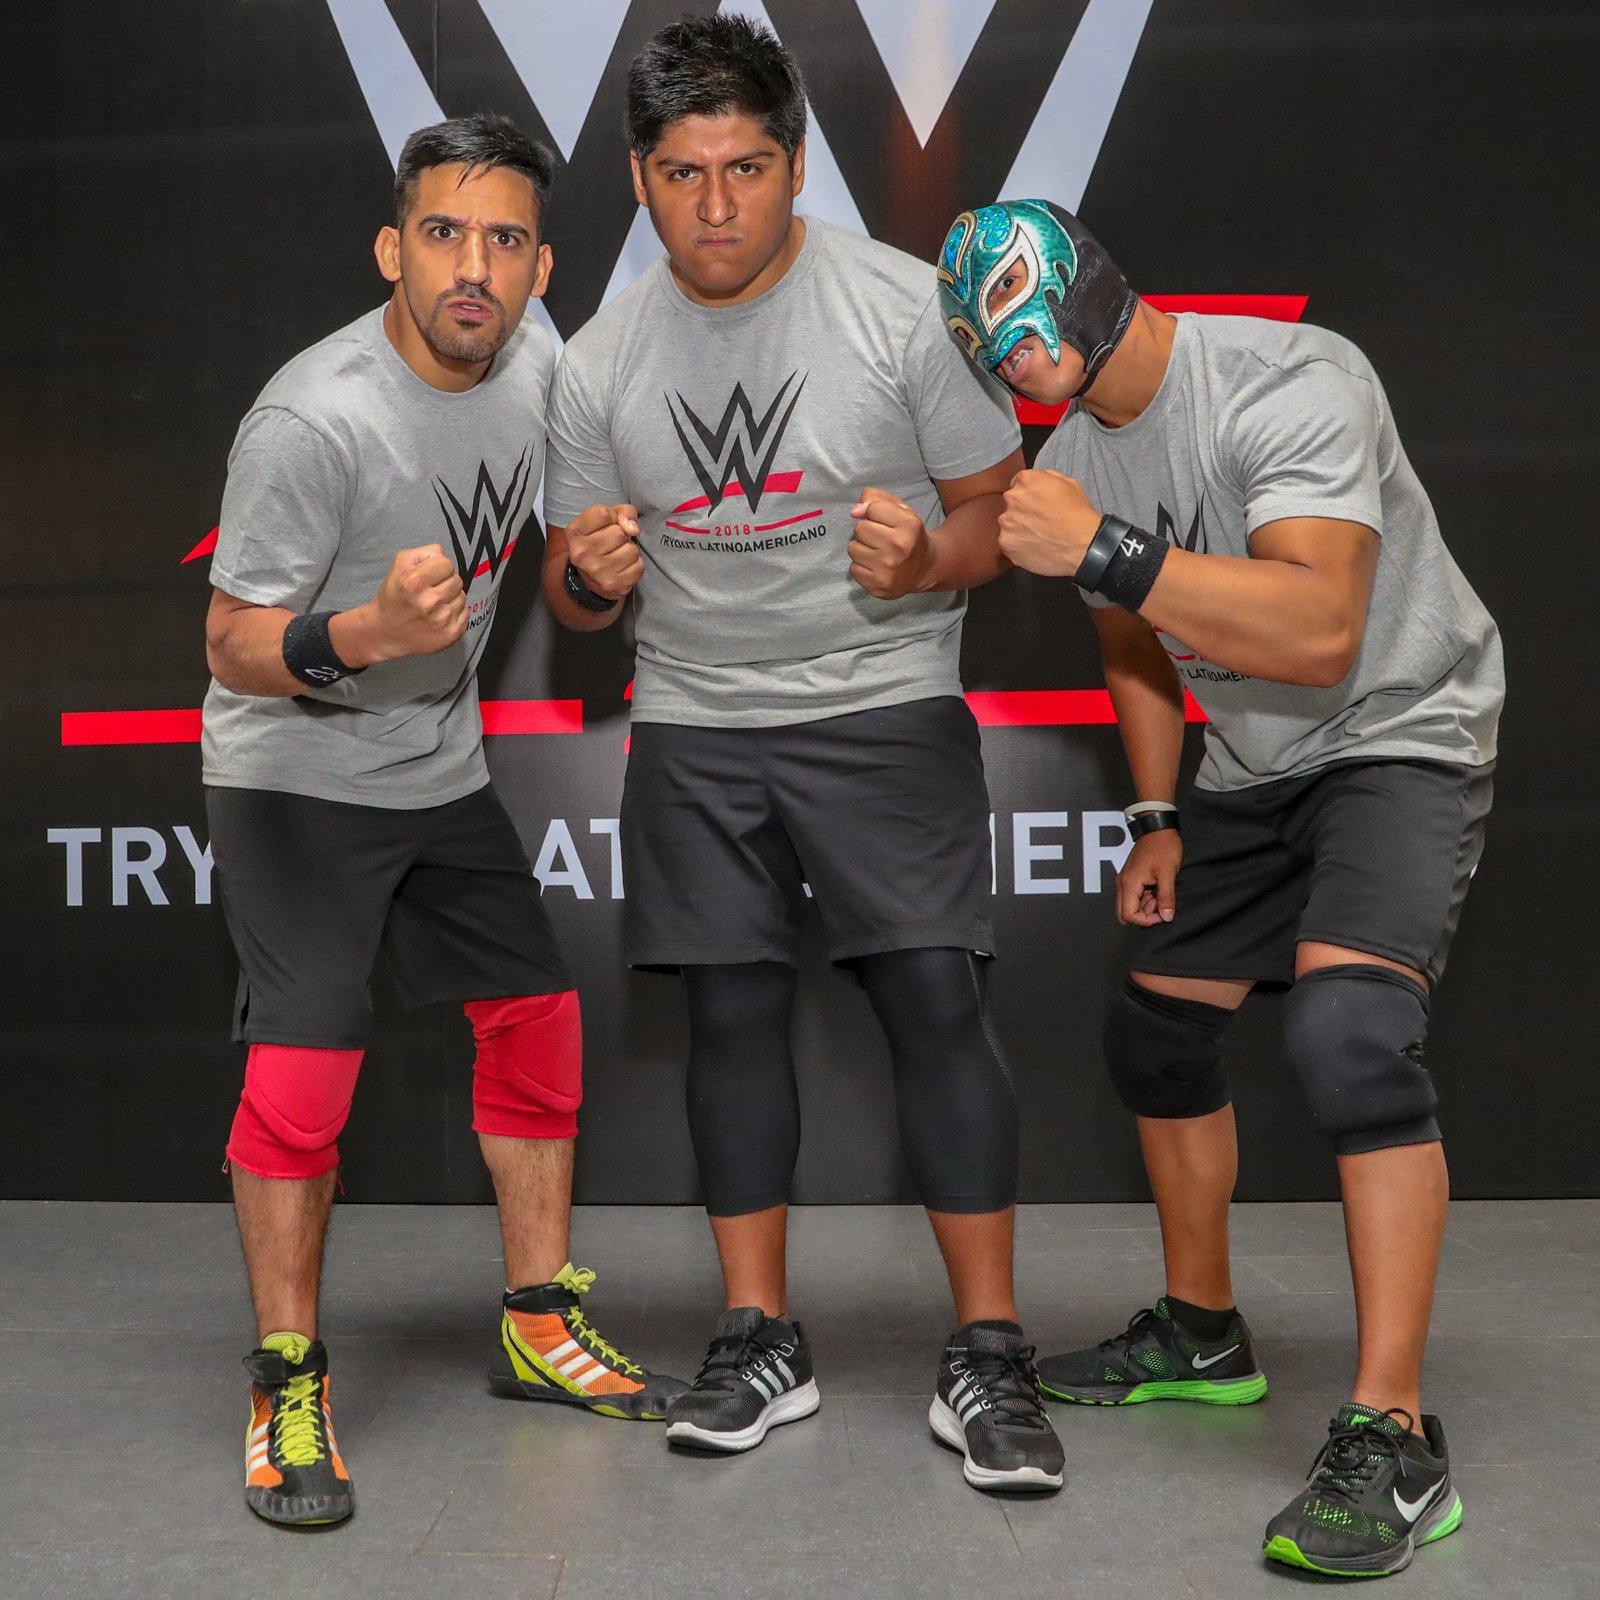 """AXL"" Carlos Héctor Román Ruíz, Daniel Mansilla and Reptil hail from Peru."